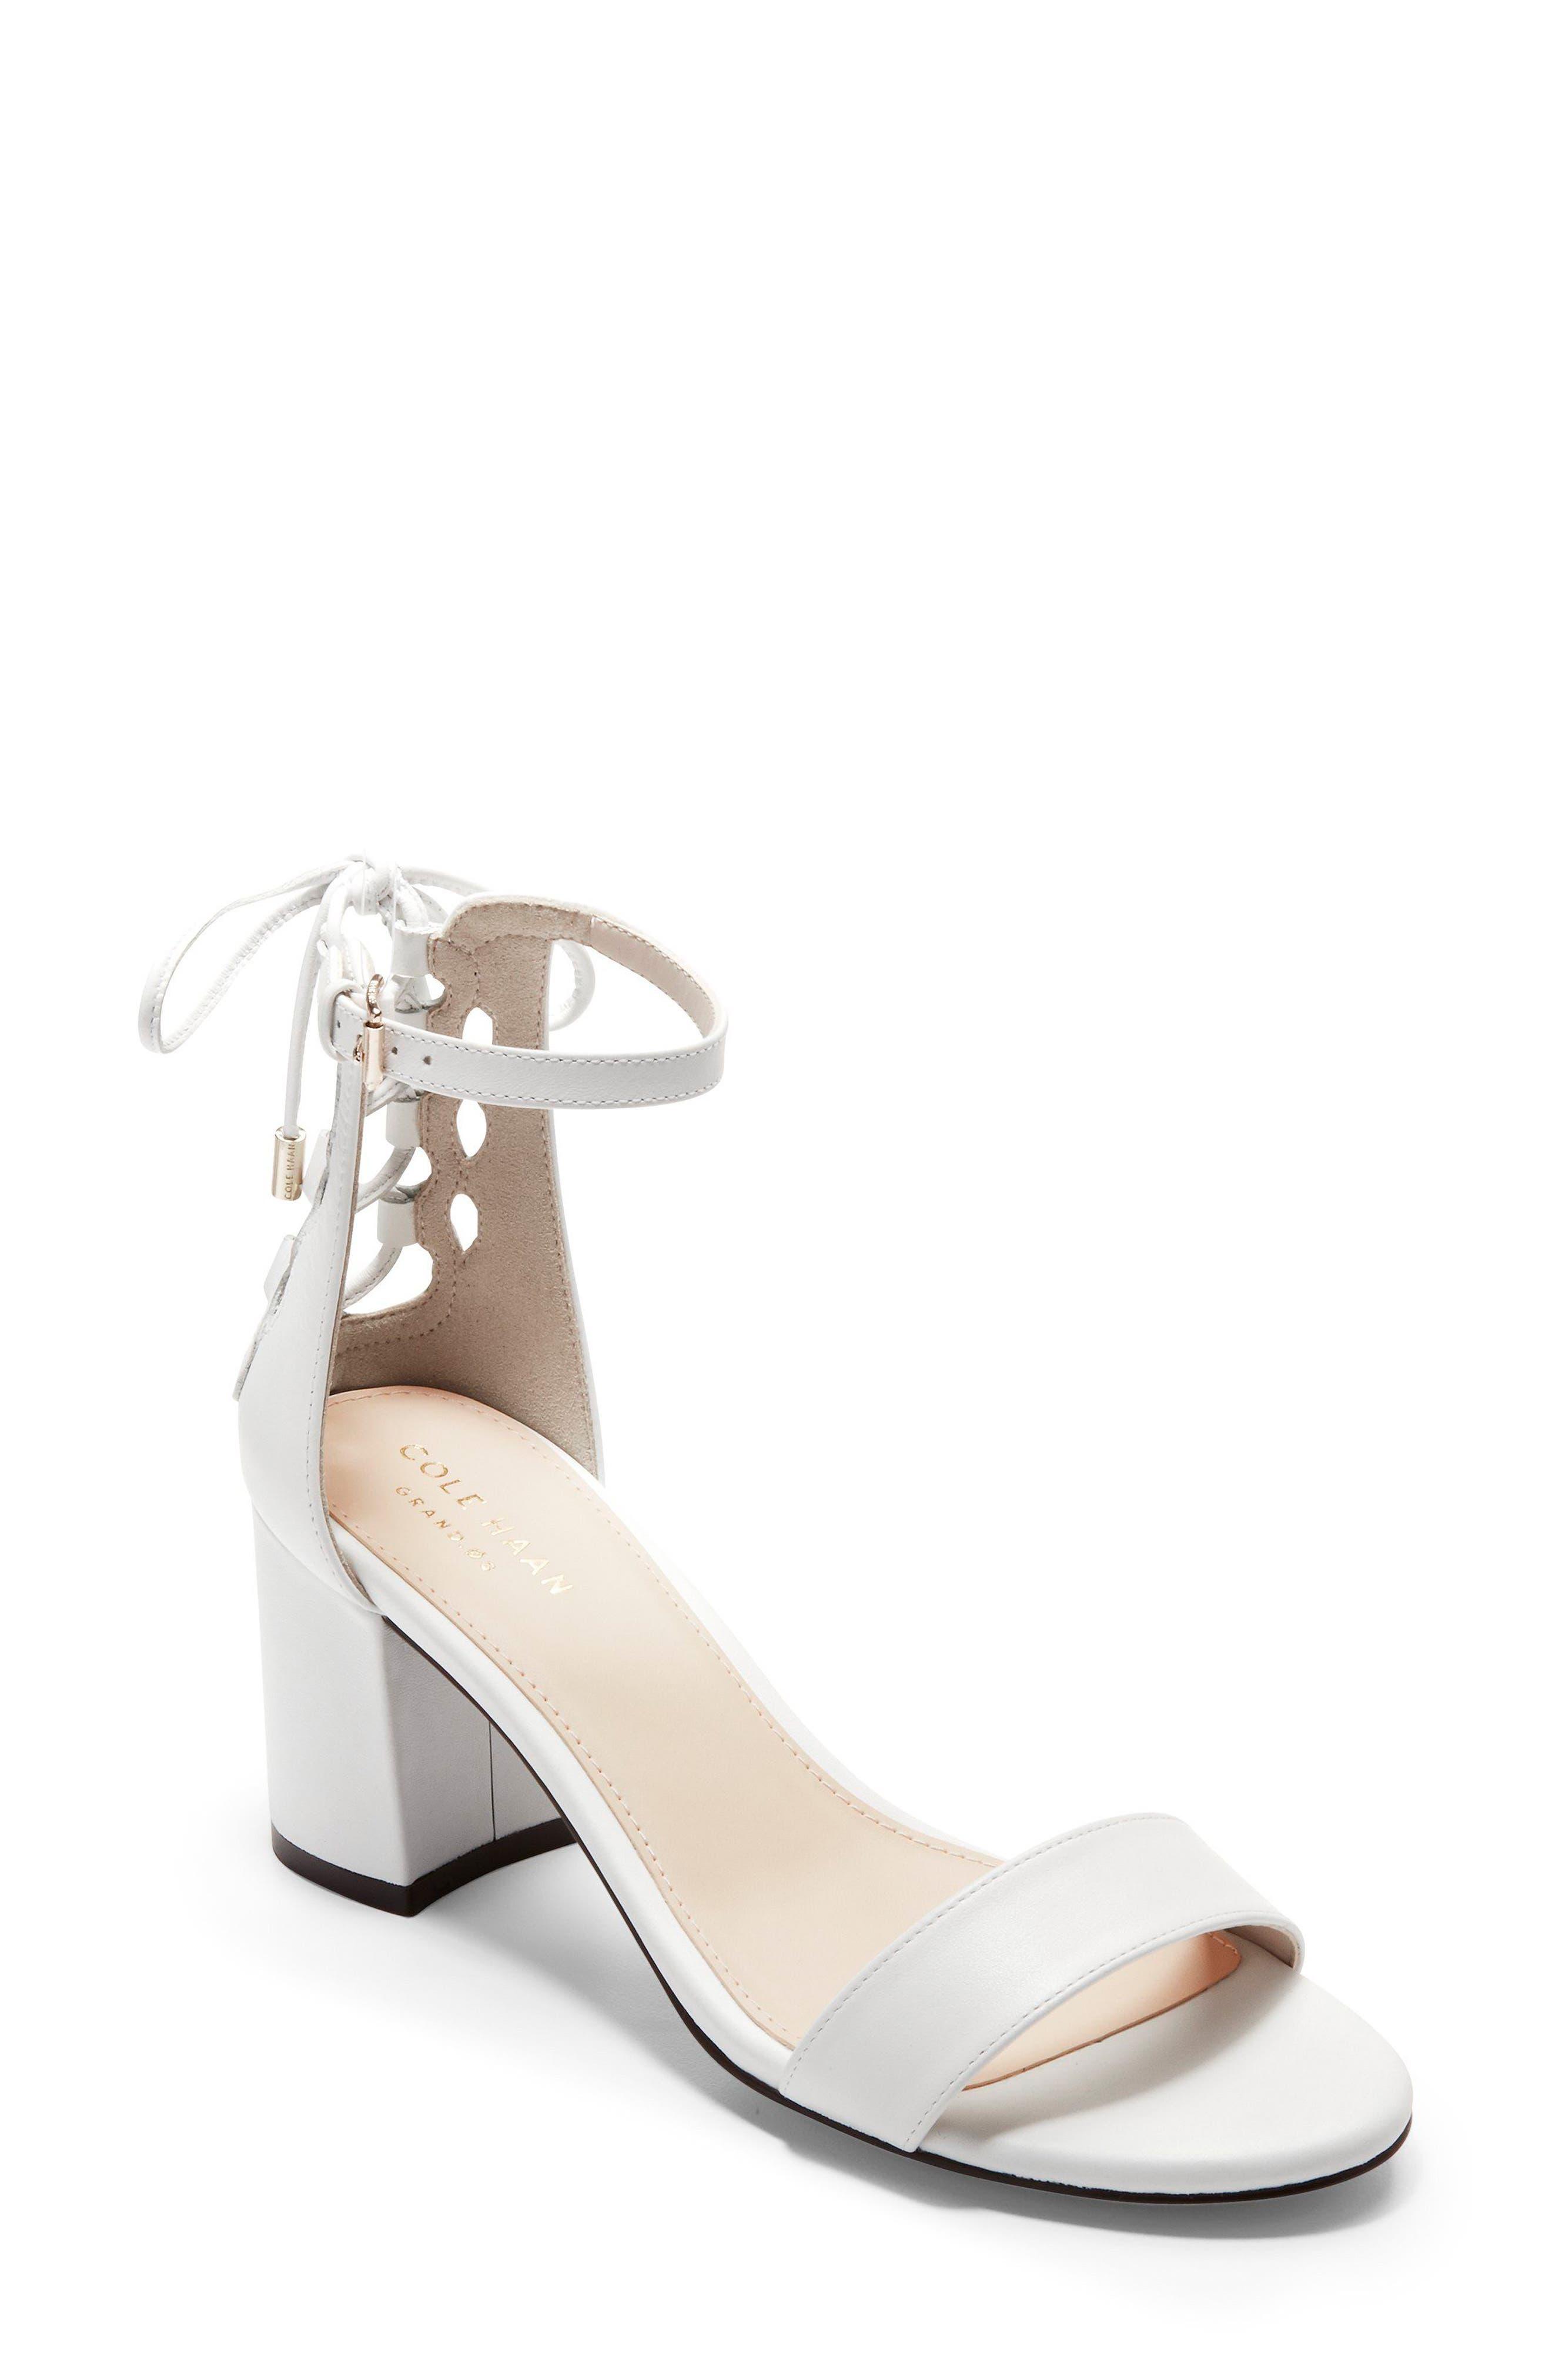 Leah Sandal,                             Main thumbnail 1, color,                             White Leather